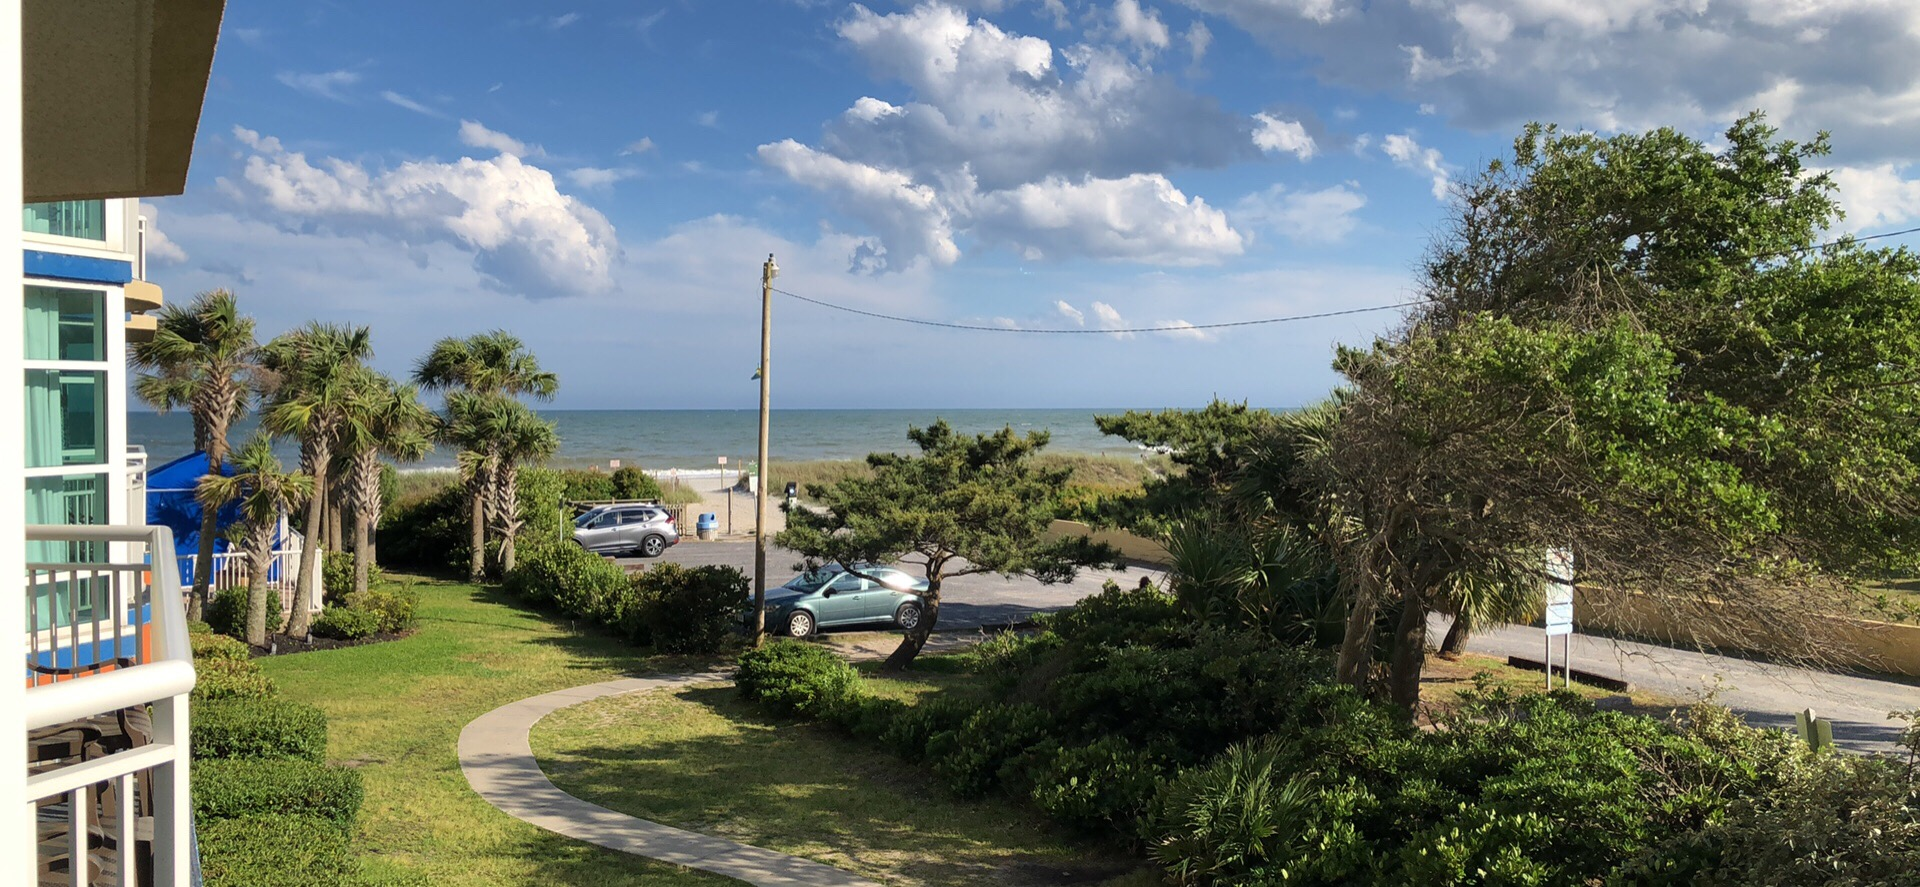 Dunes Village Resort image